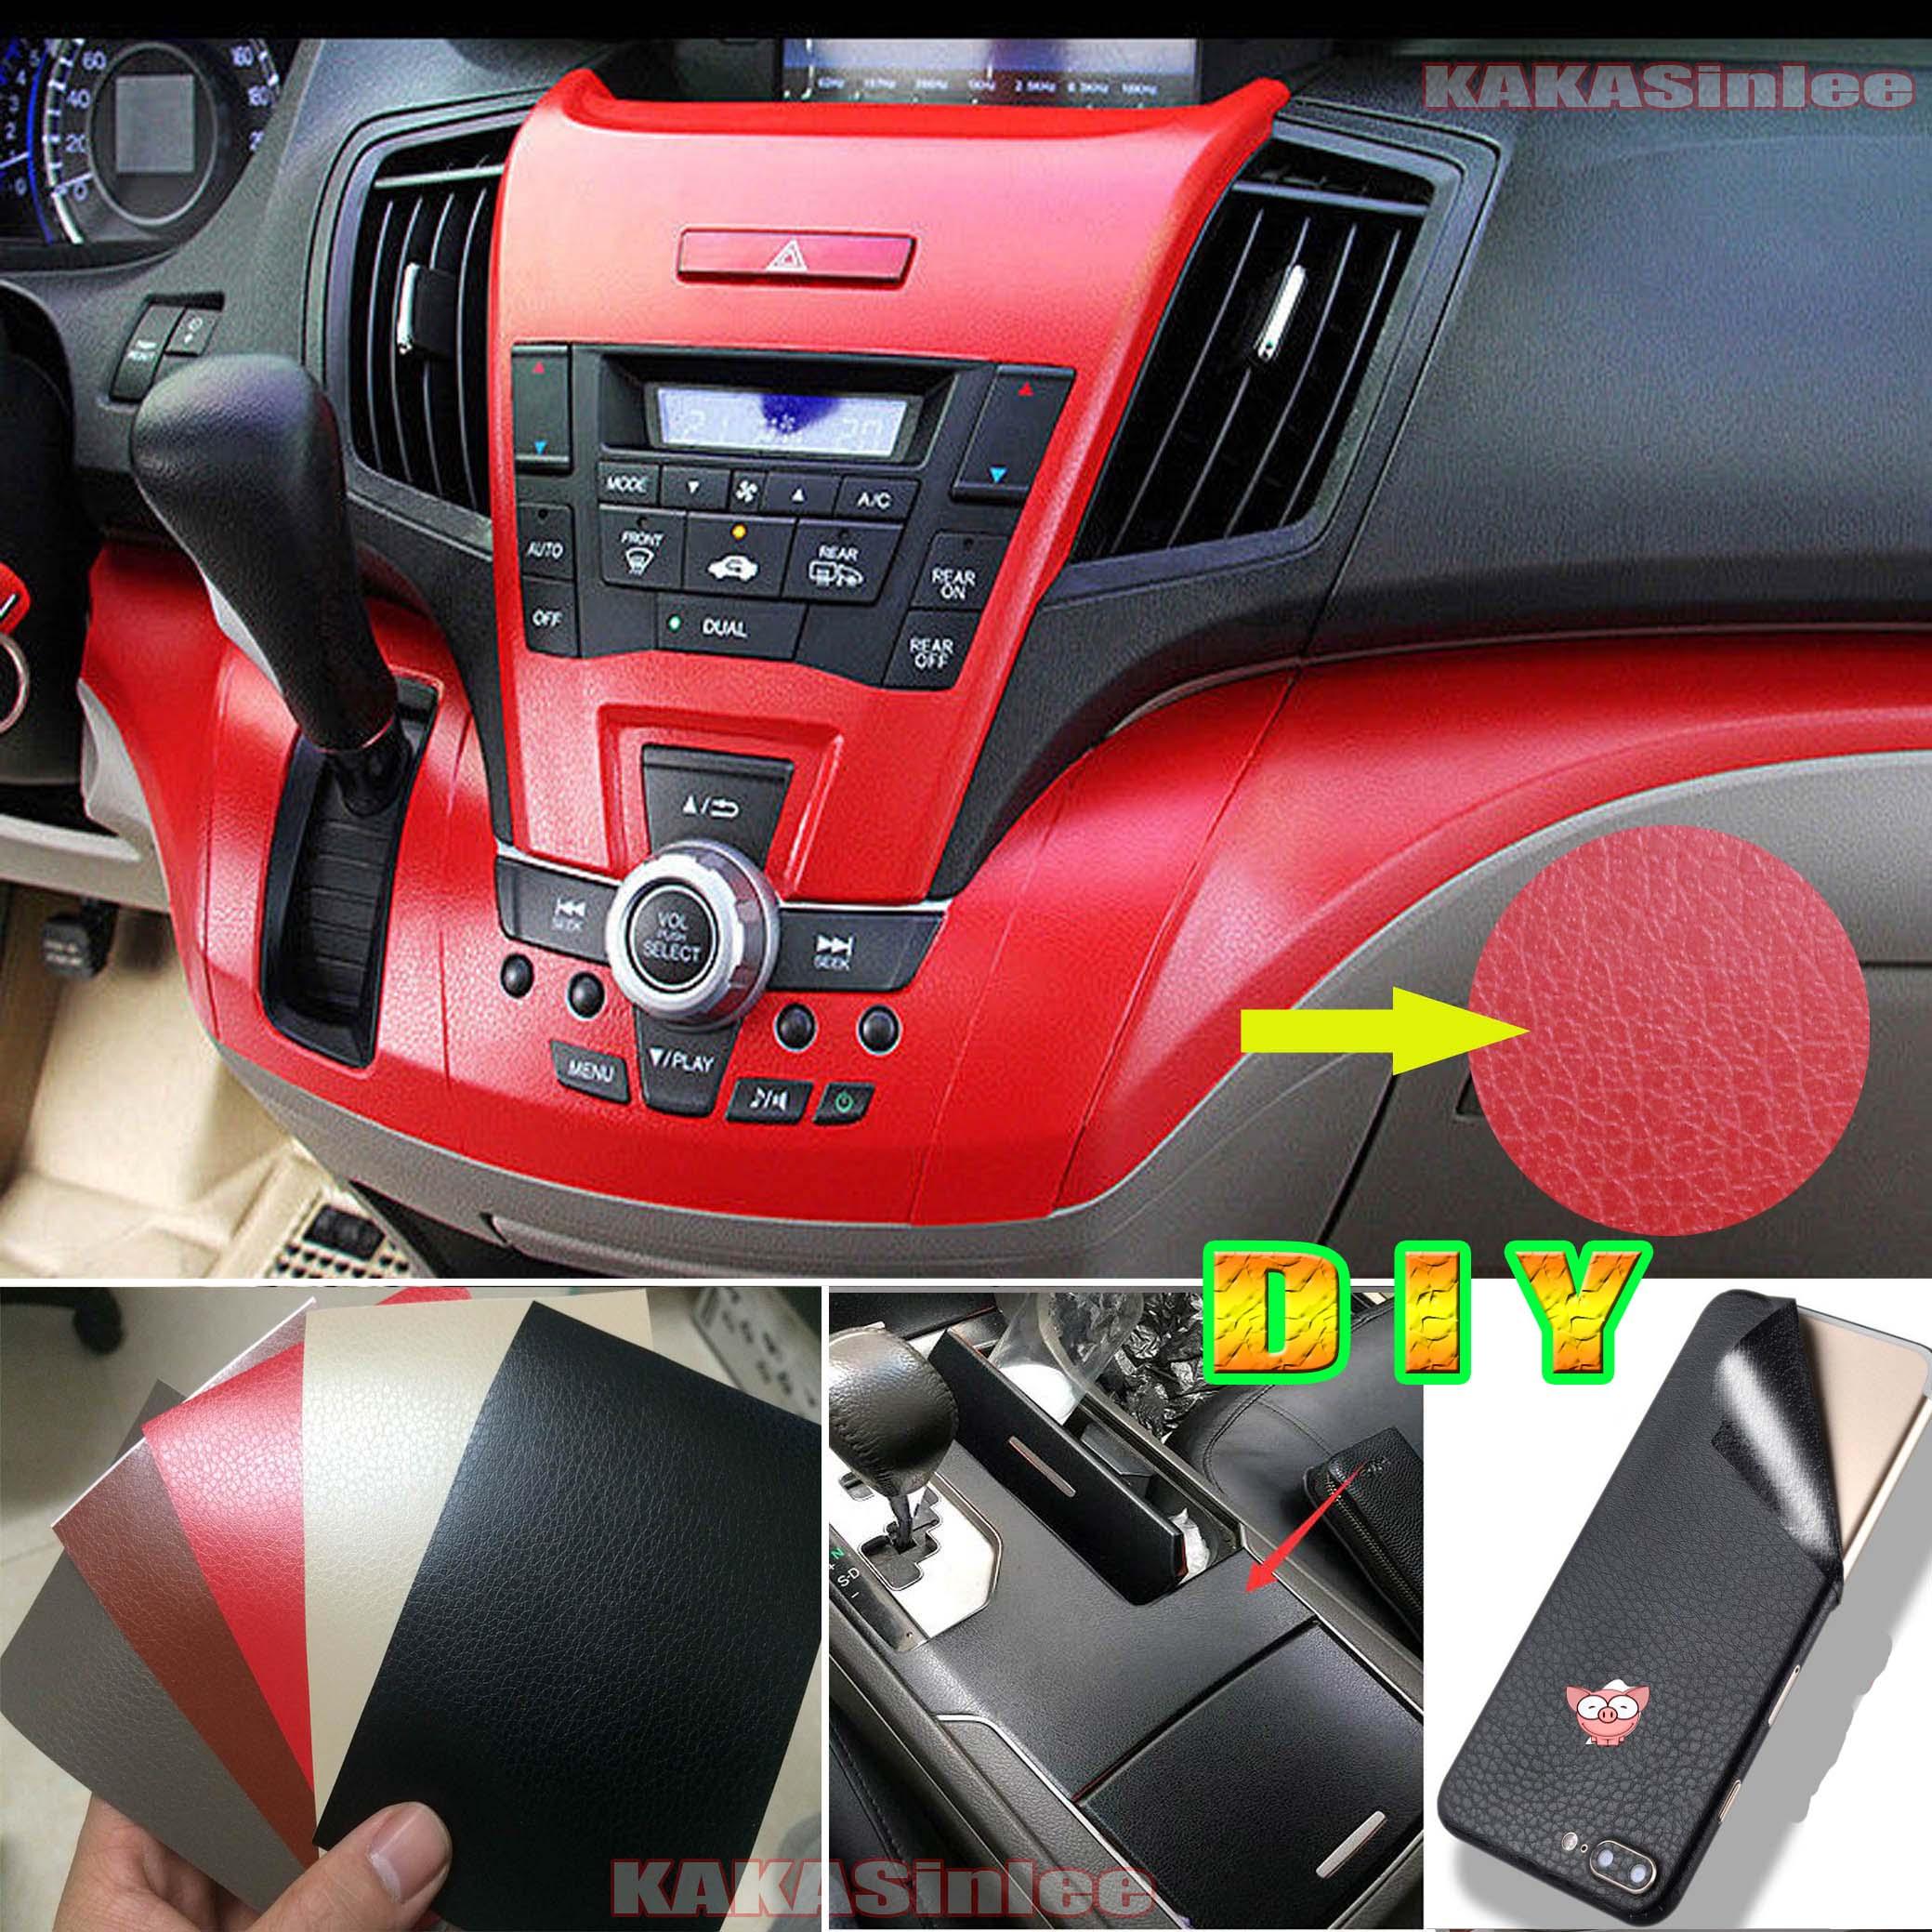 Test Sample 8cm X 12cm Car Matte Leather Texture Skin